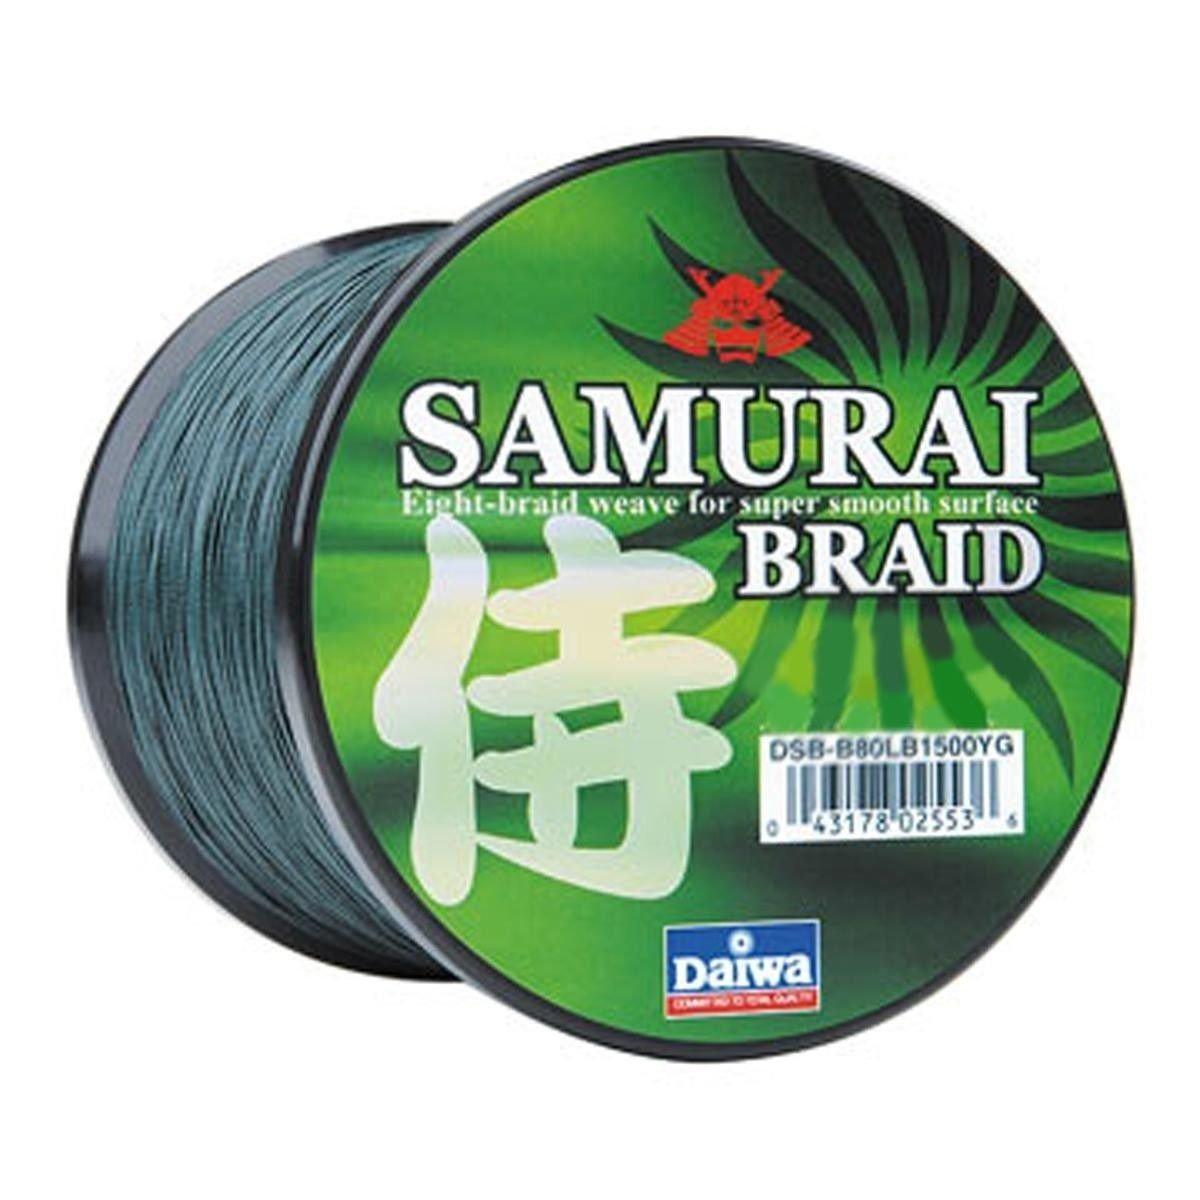 Daiwa Samurai Braid Green 20 Lb - 150 Yards by Daiwa (Image #1)